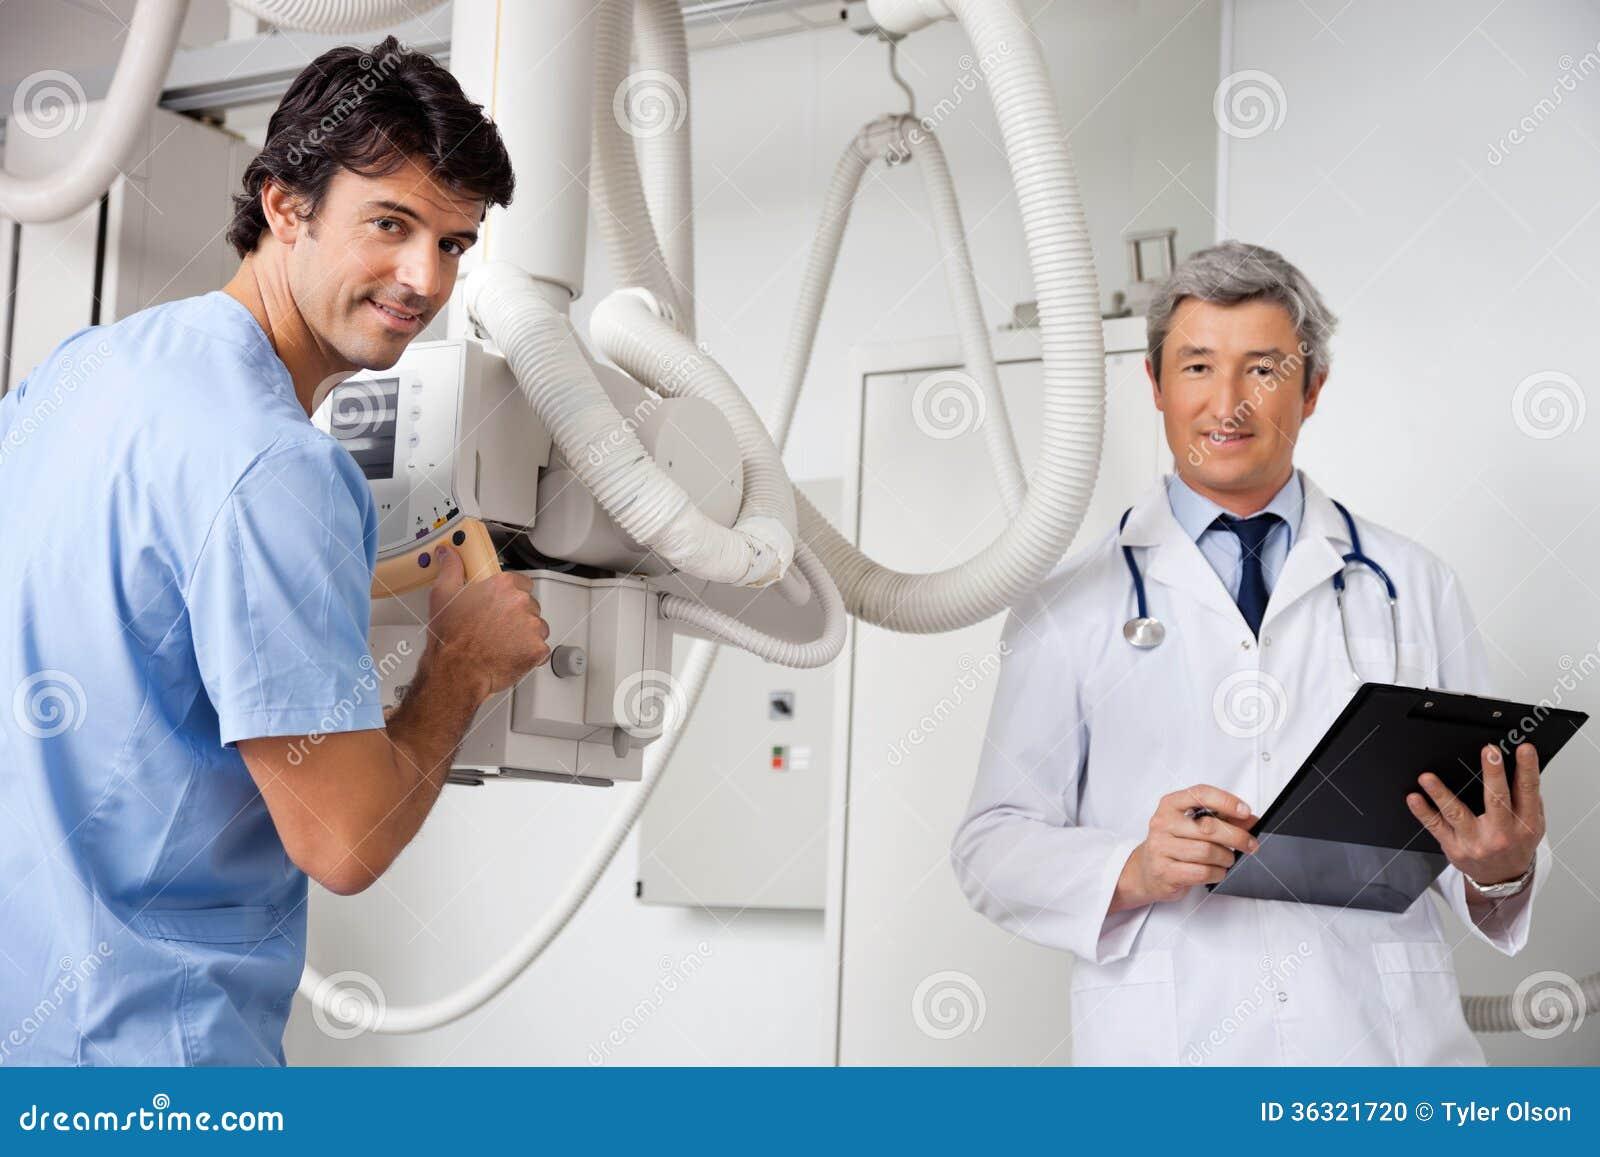 Радиолог фото